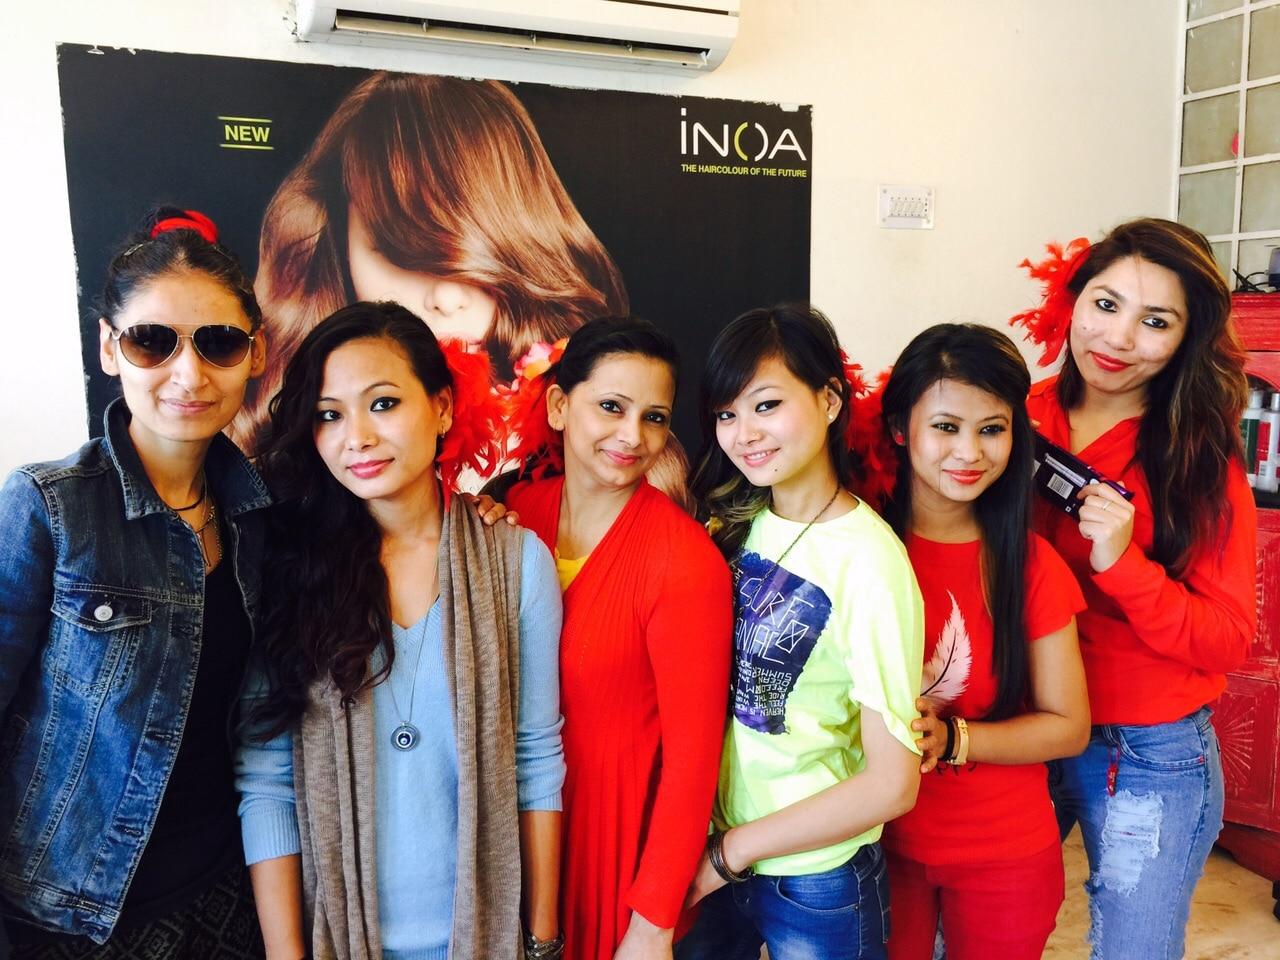 Gossip Hair and Beauty Salon